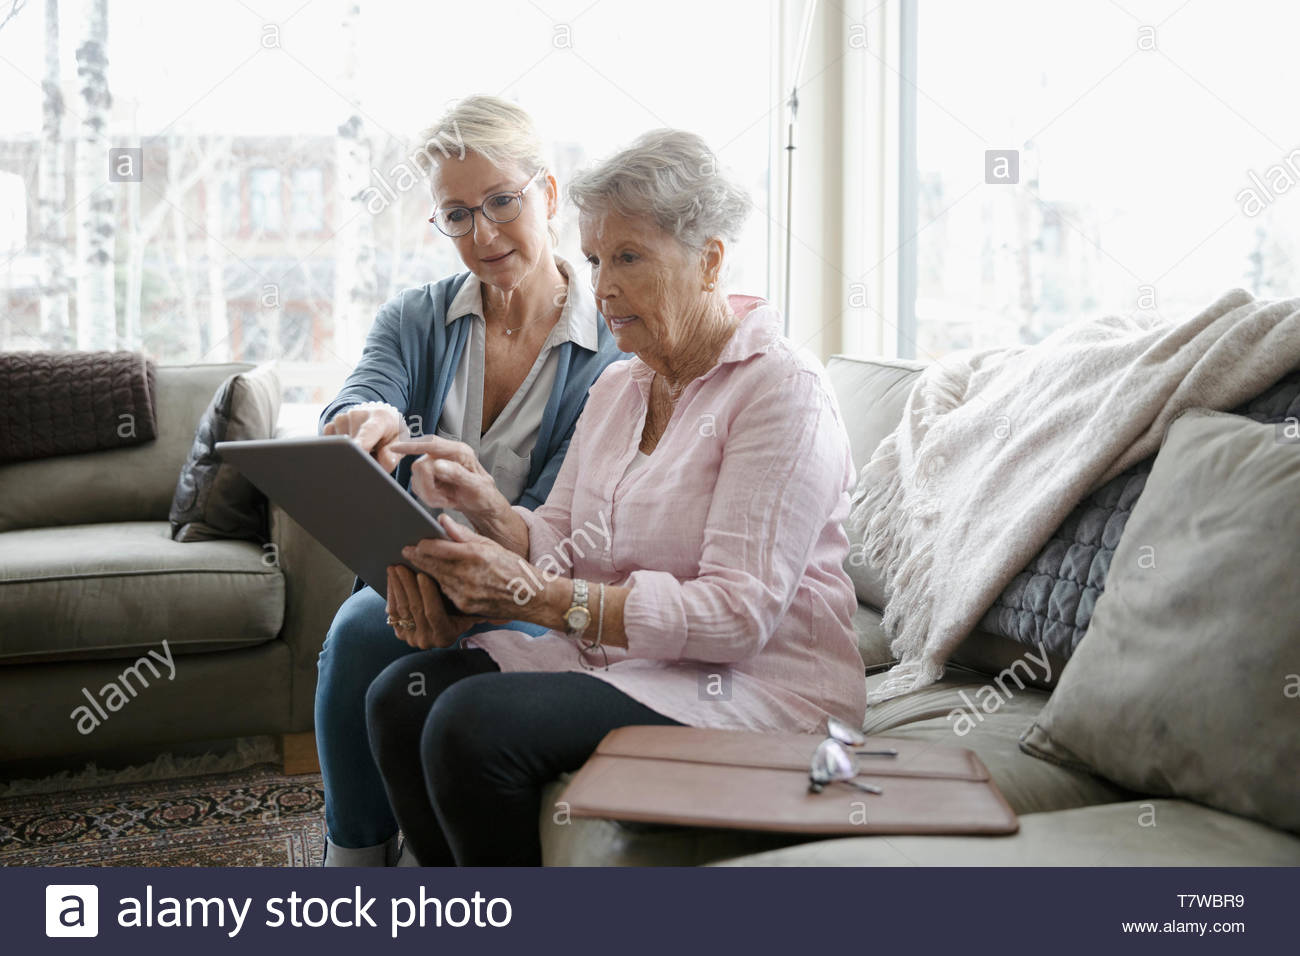 Daughter helping senior mother using digital tablet - Stock Image